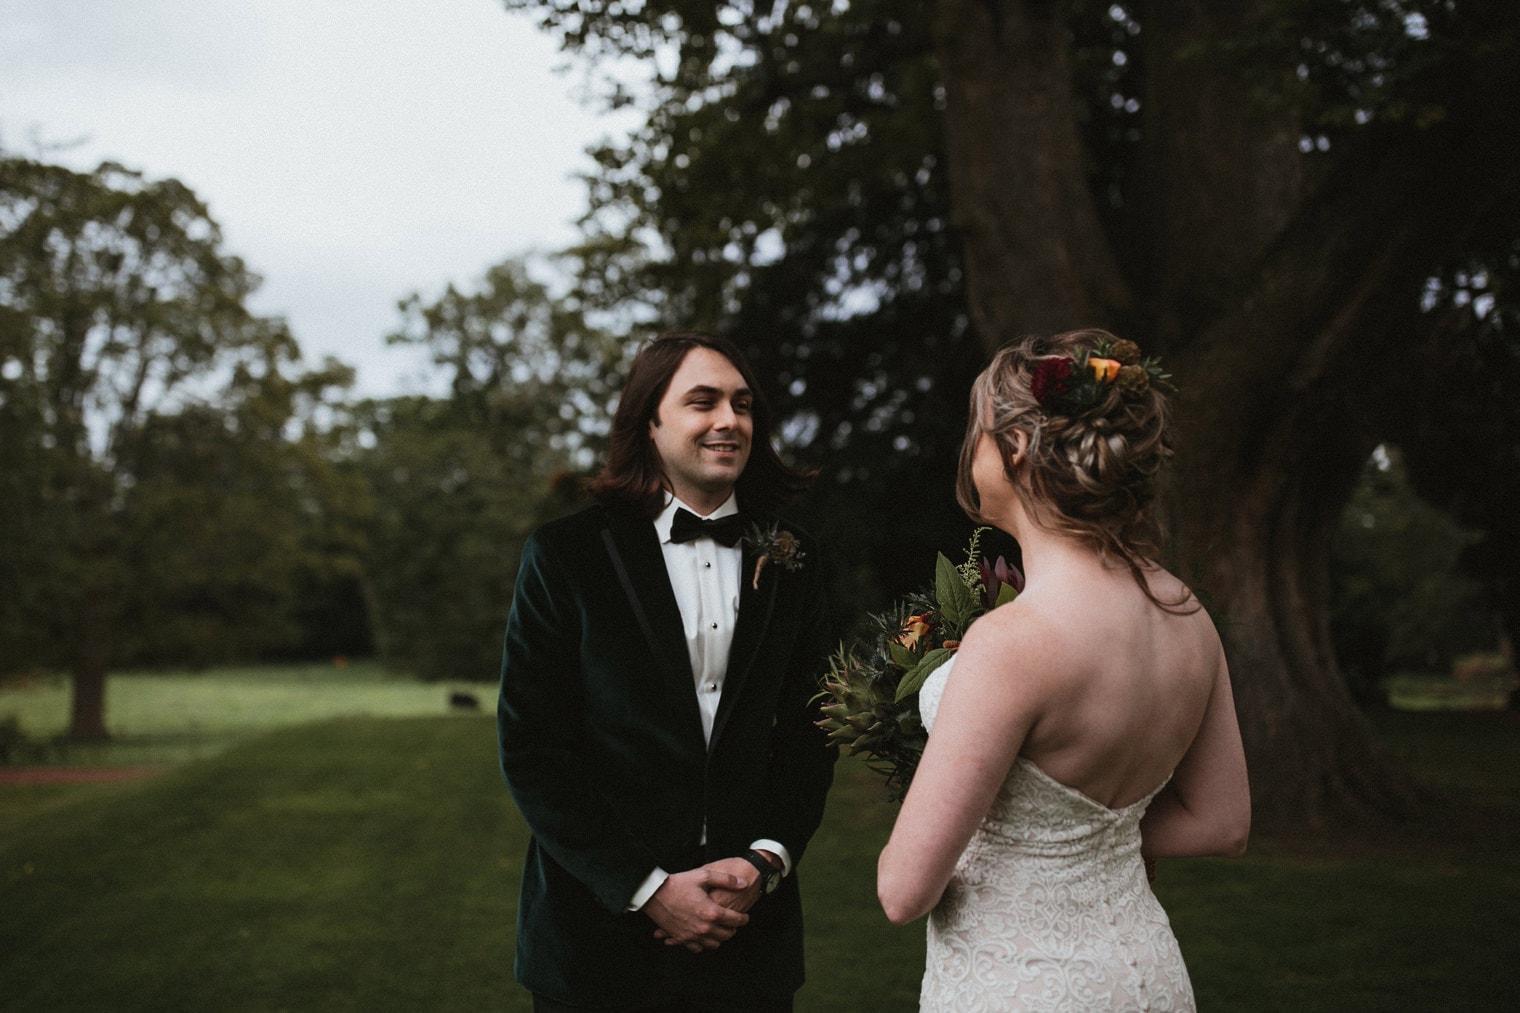 Bride and groom first look during their scotland wedding in Edinburgh